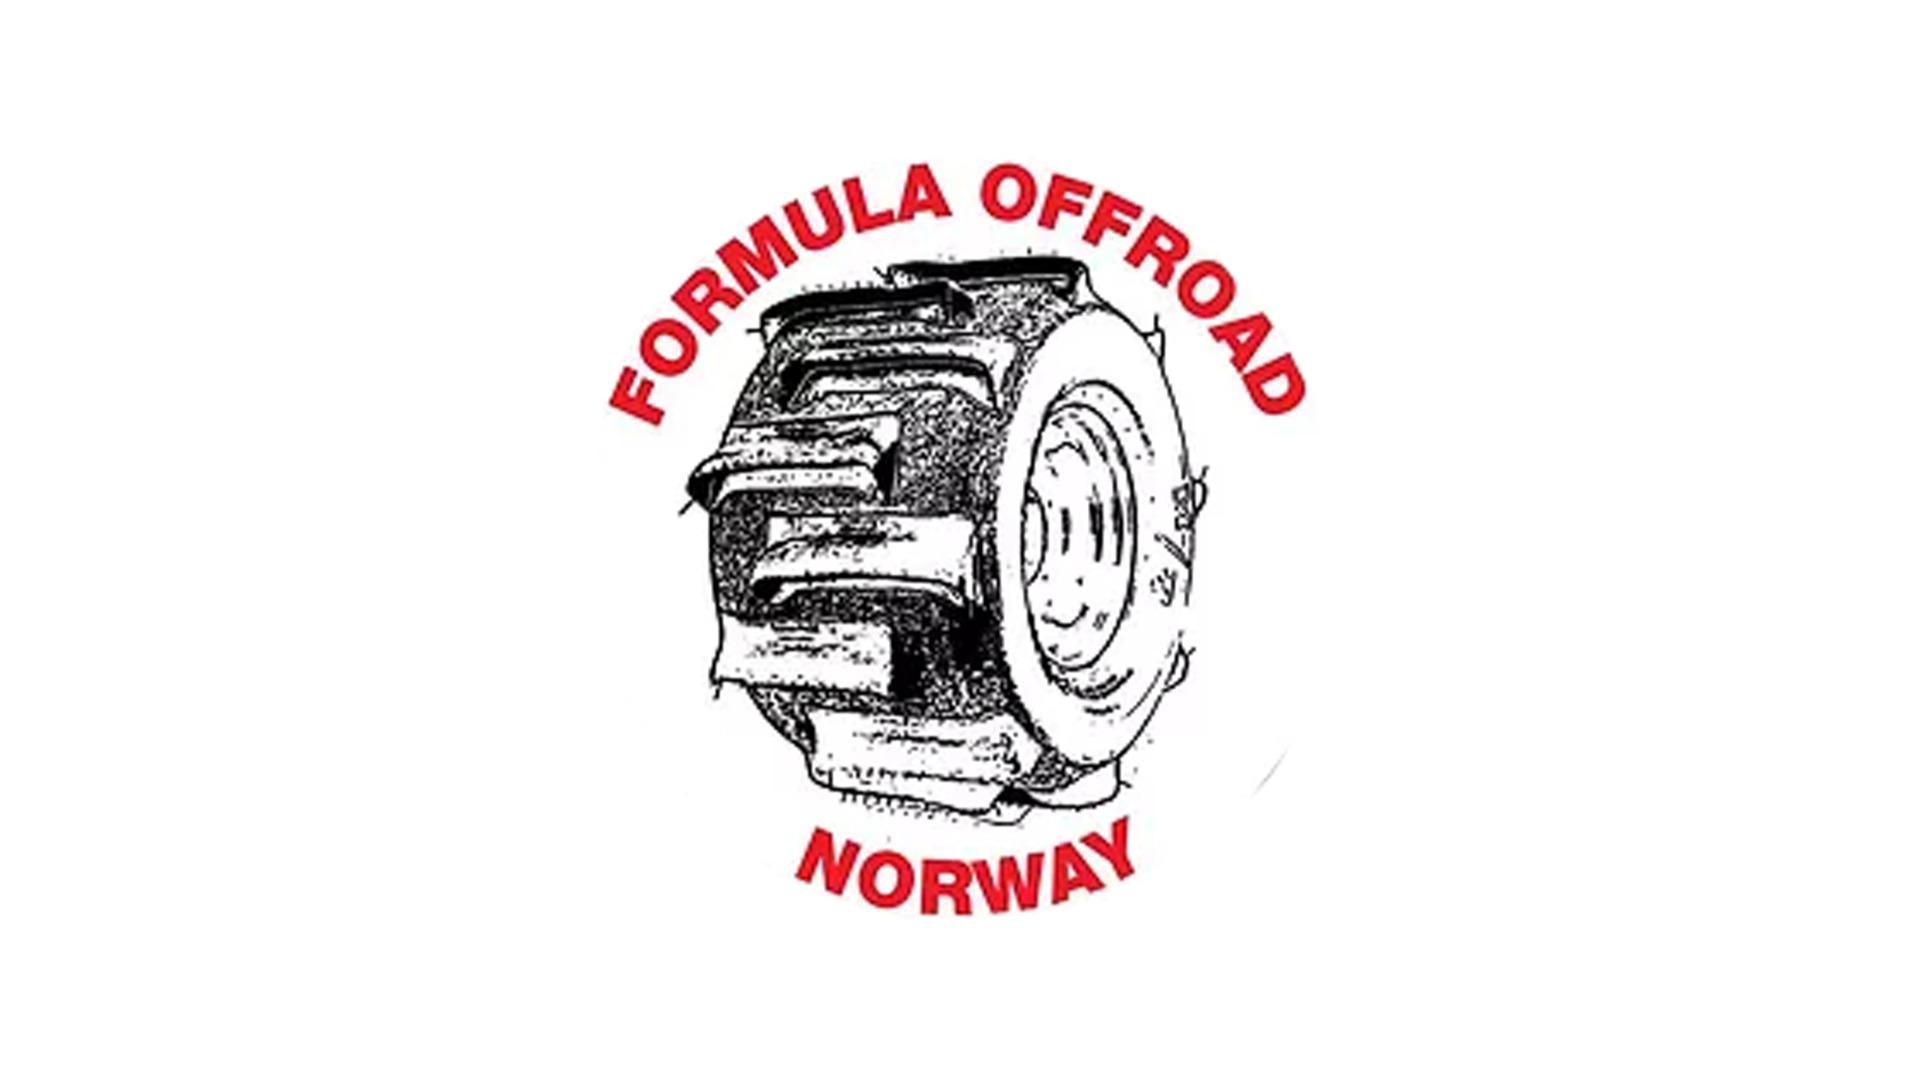 Formula+offroad+norway-Fullskjerm.jpg